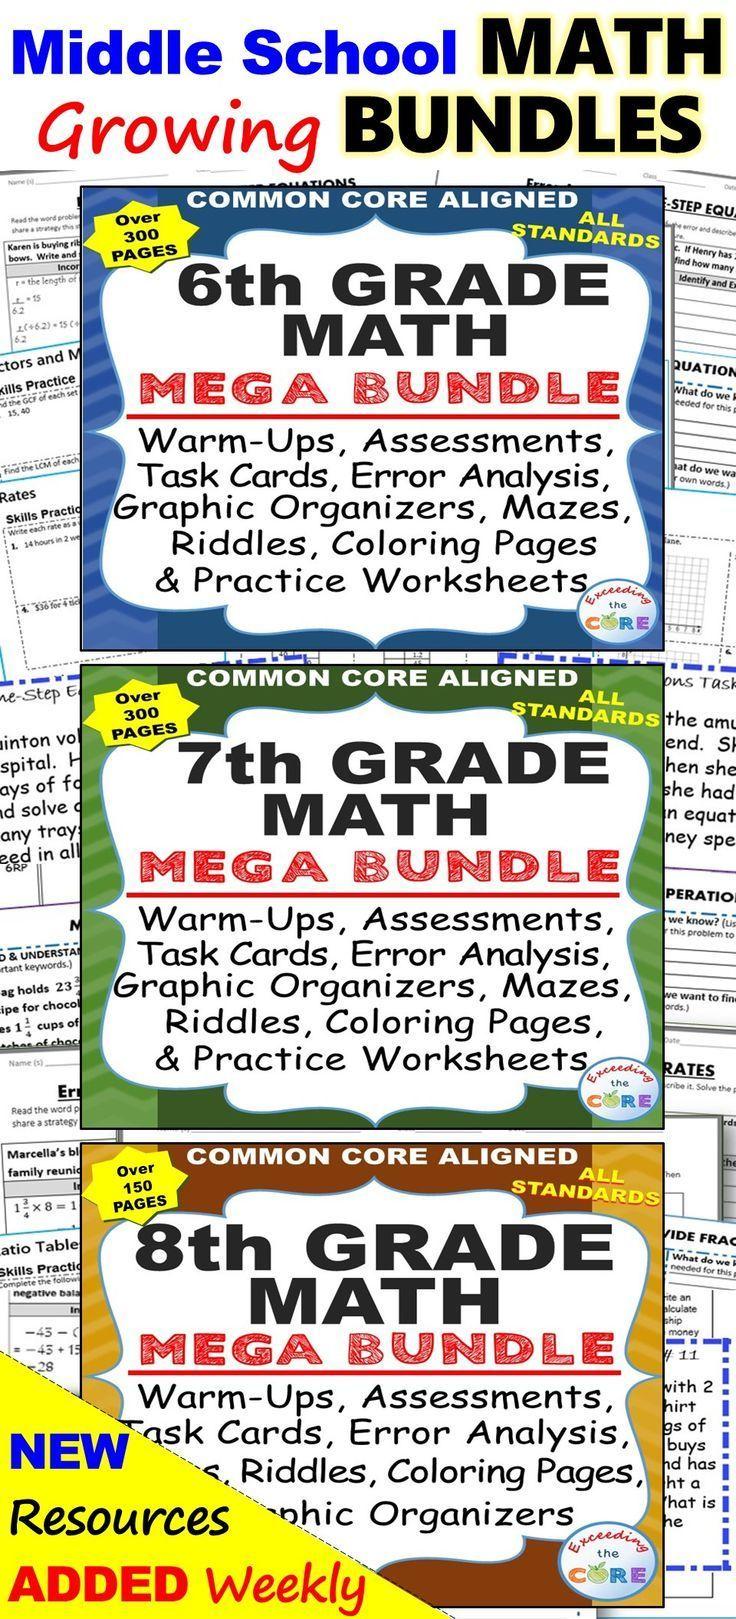 Middle School Math Growing Bundle Common Core Middle School Math Middle School Math [ 1619 x 736 Pixel ]